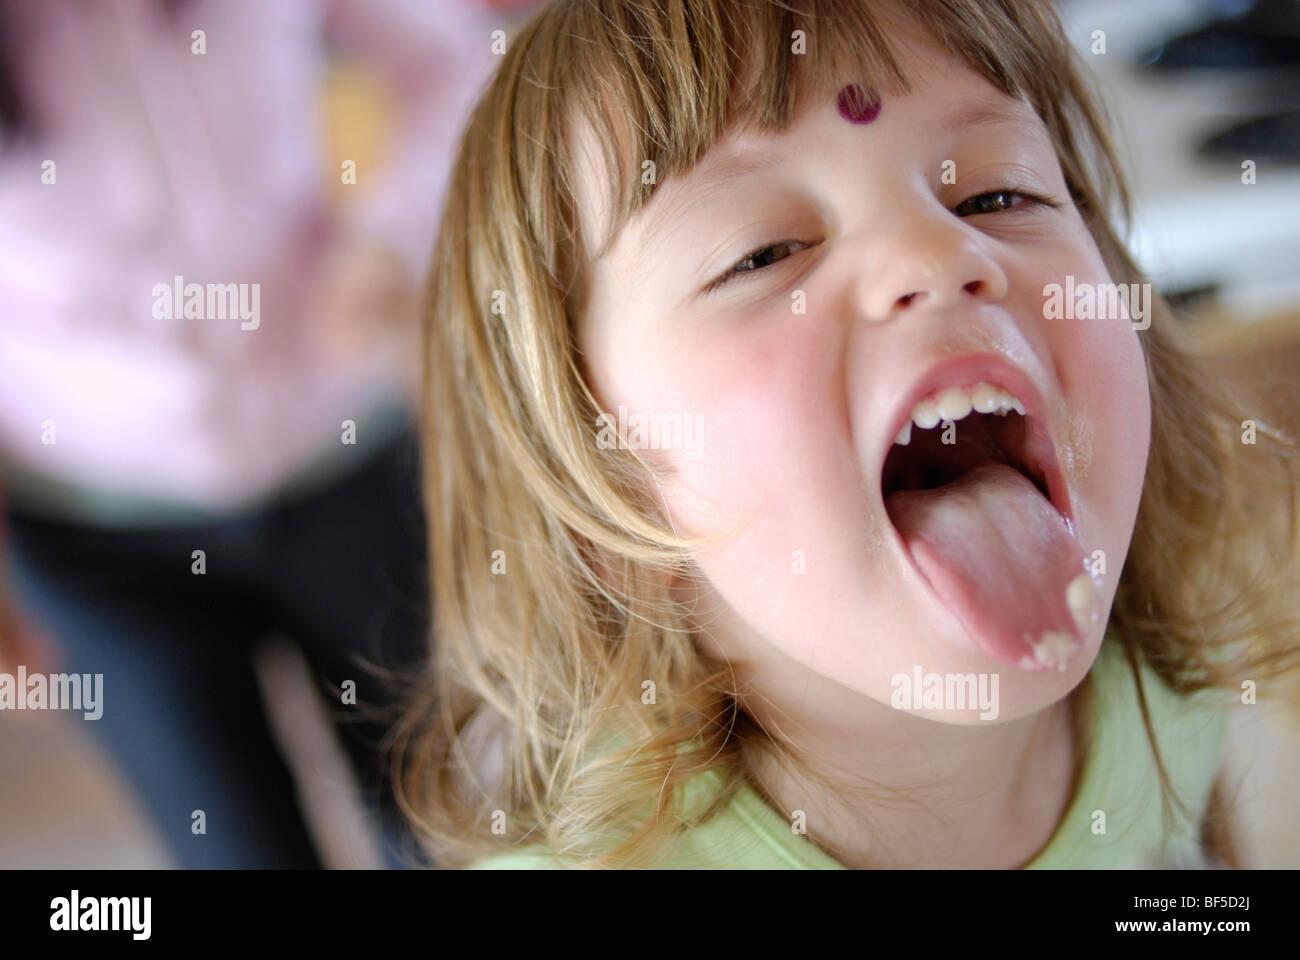 Licking my ice cream